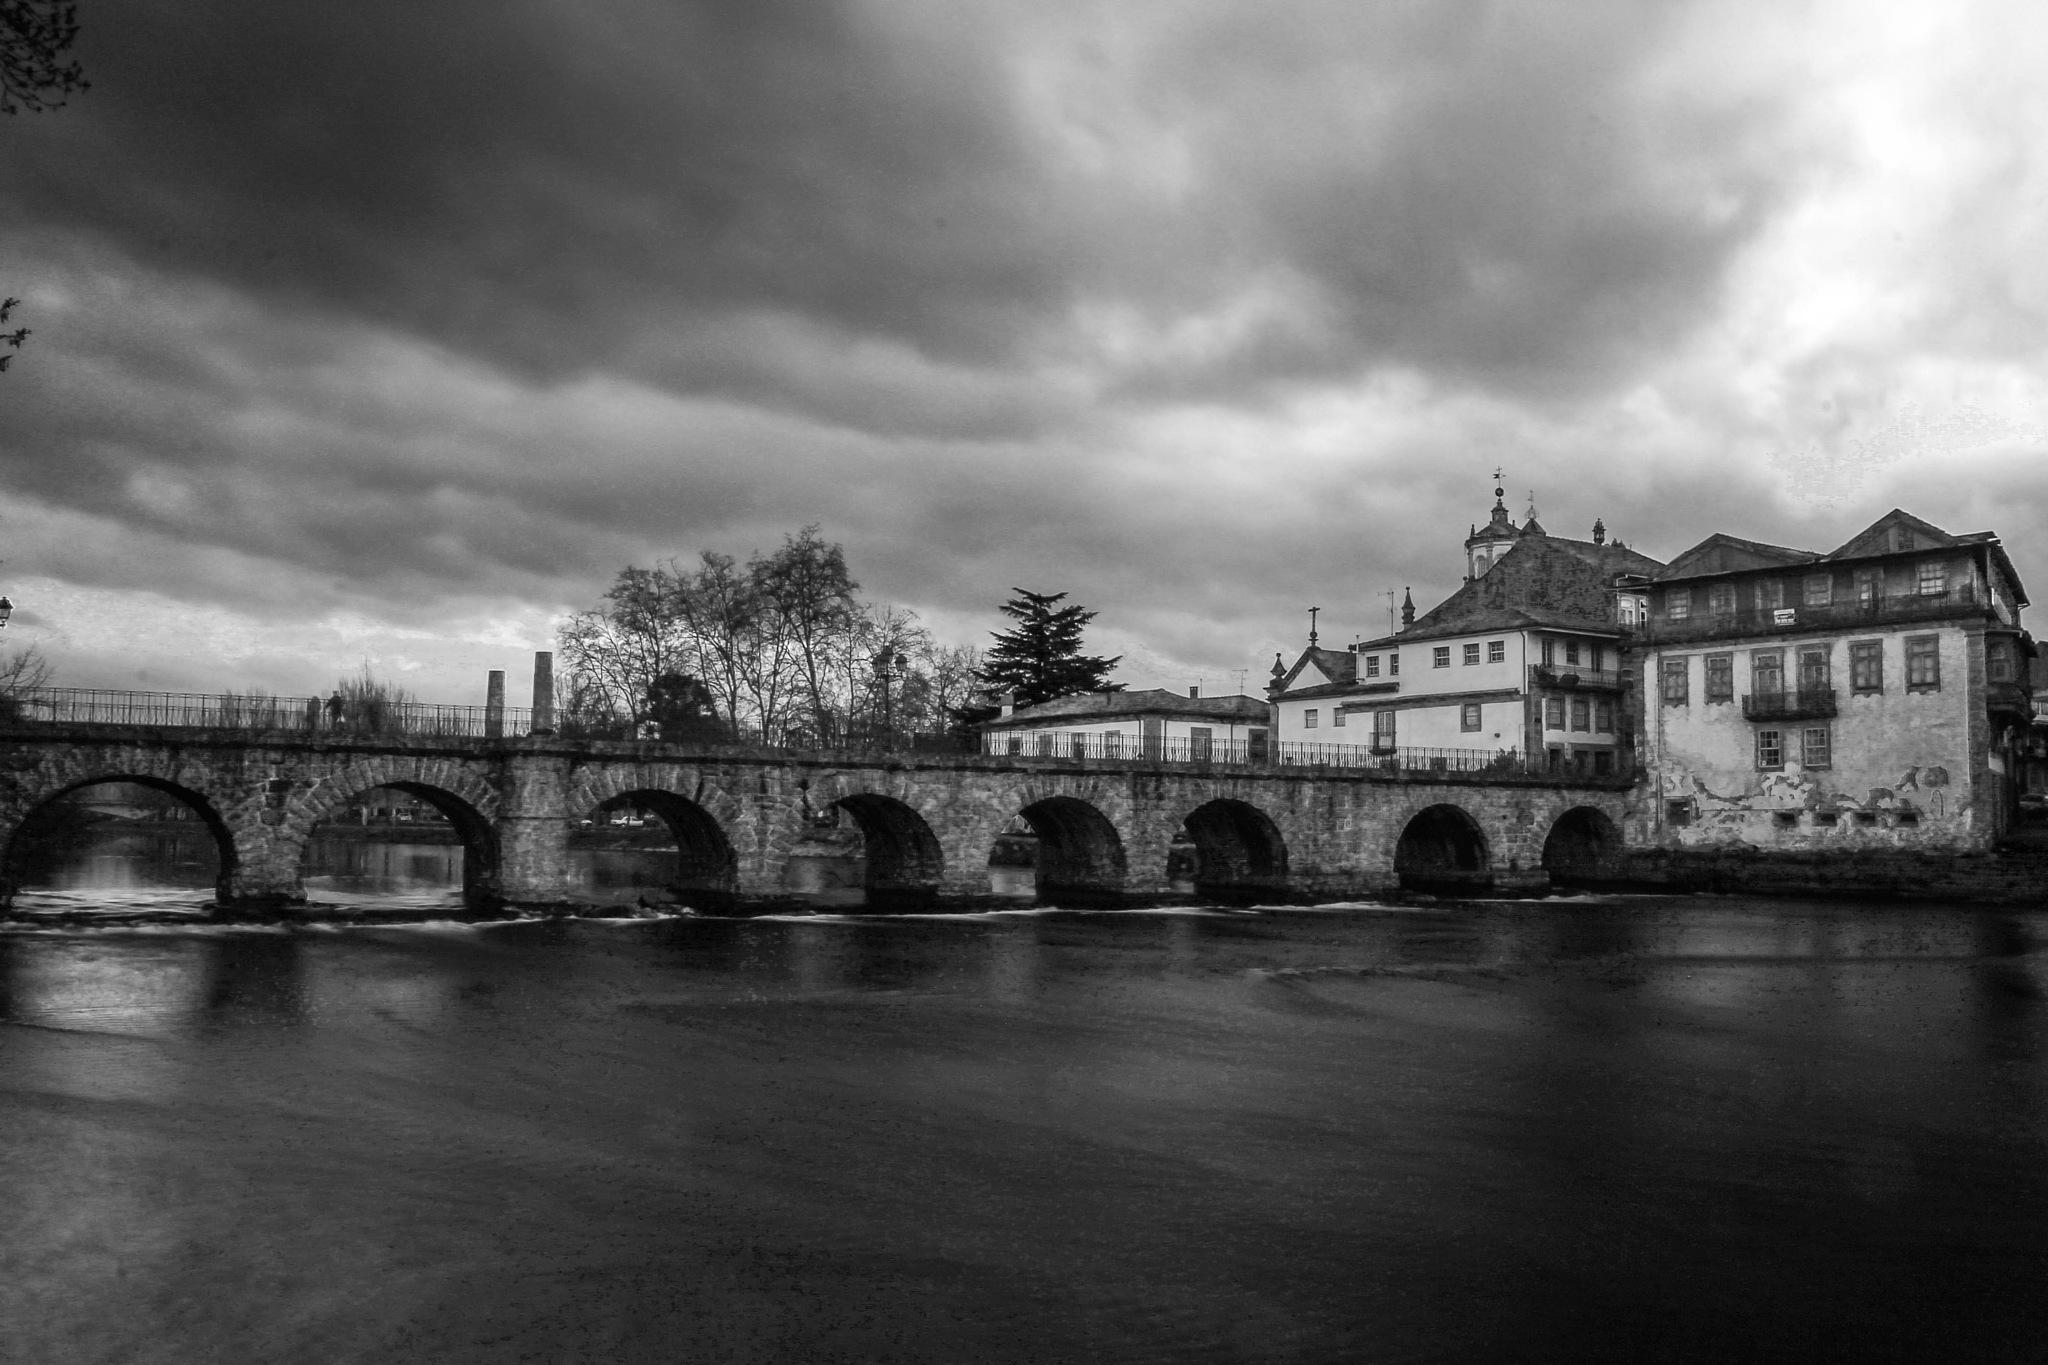 Roman Bridge by Lamartine Dias